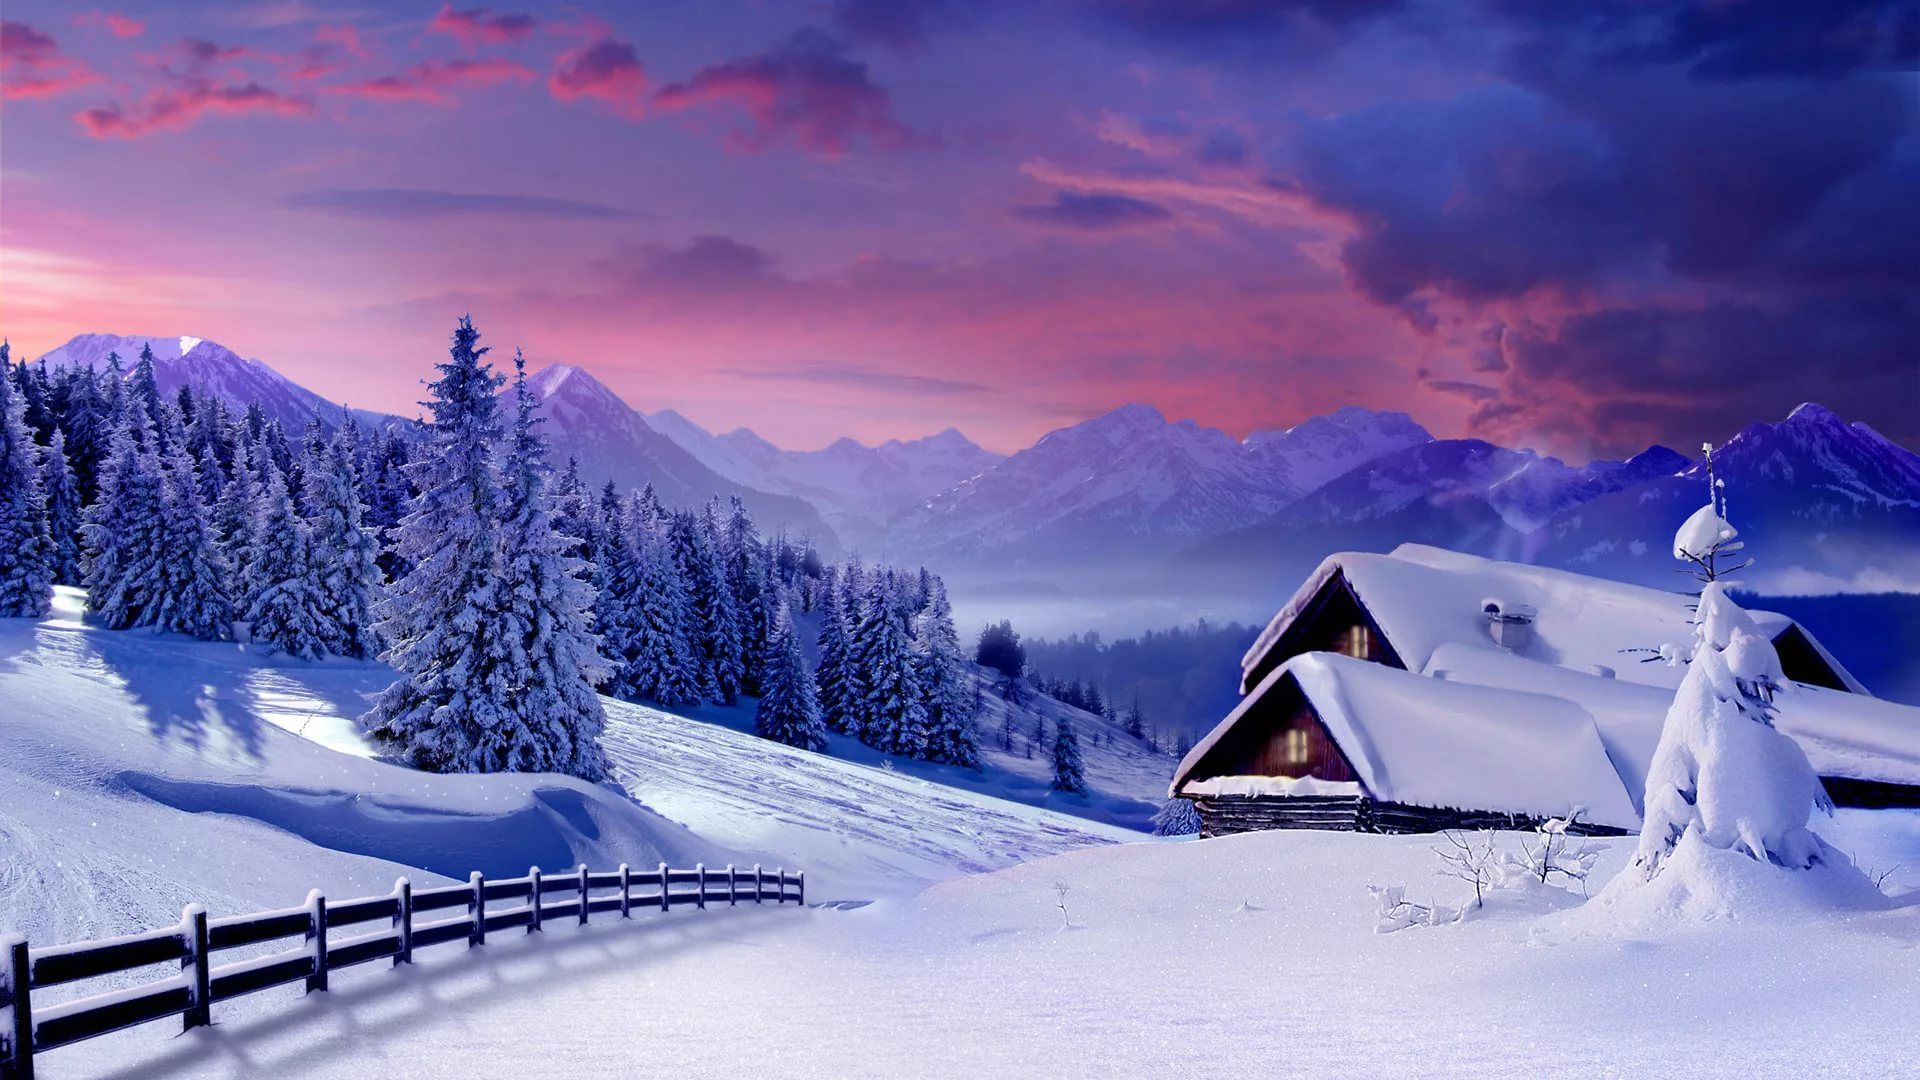 Happy Winter Picture